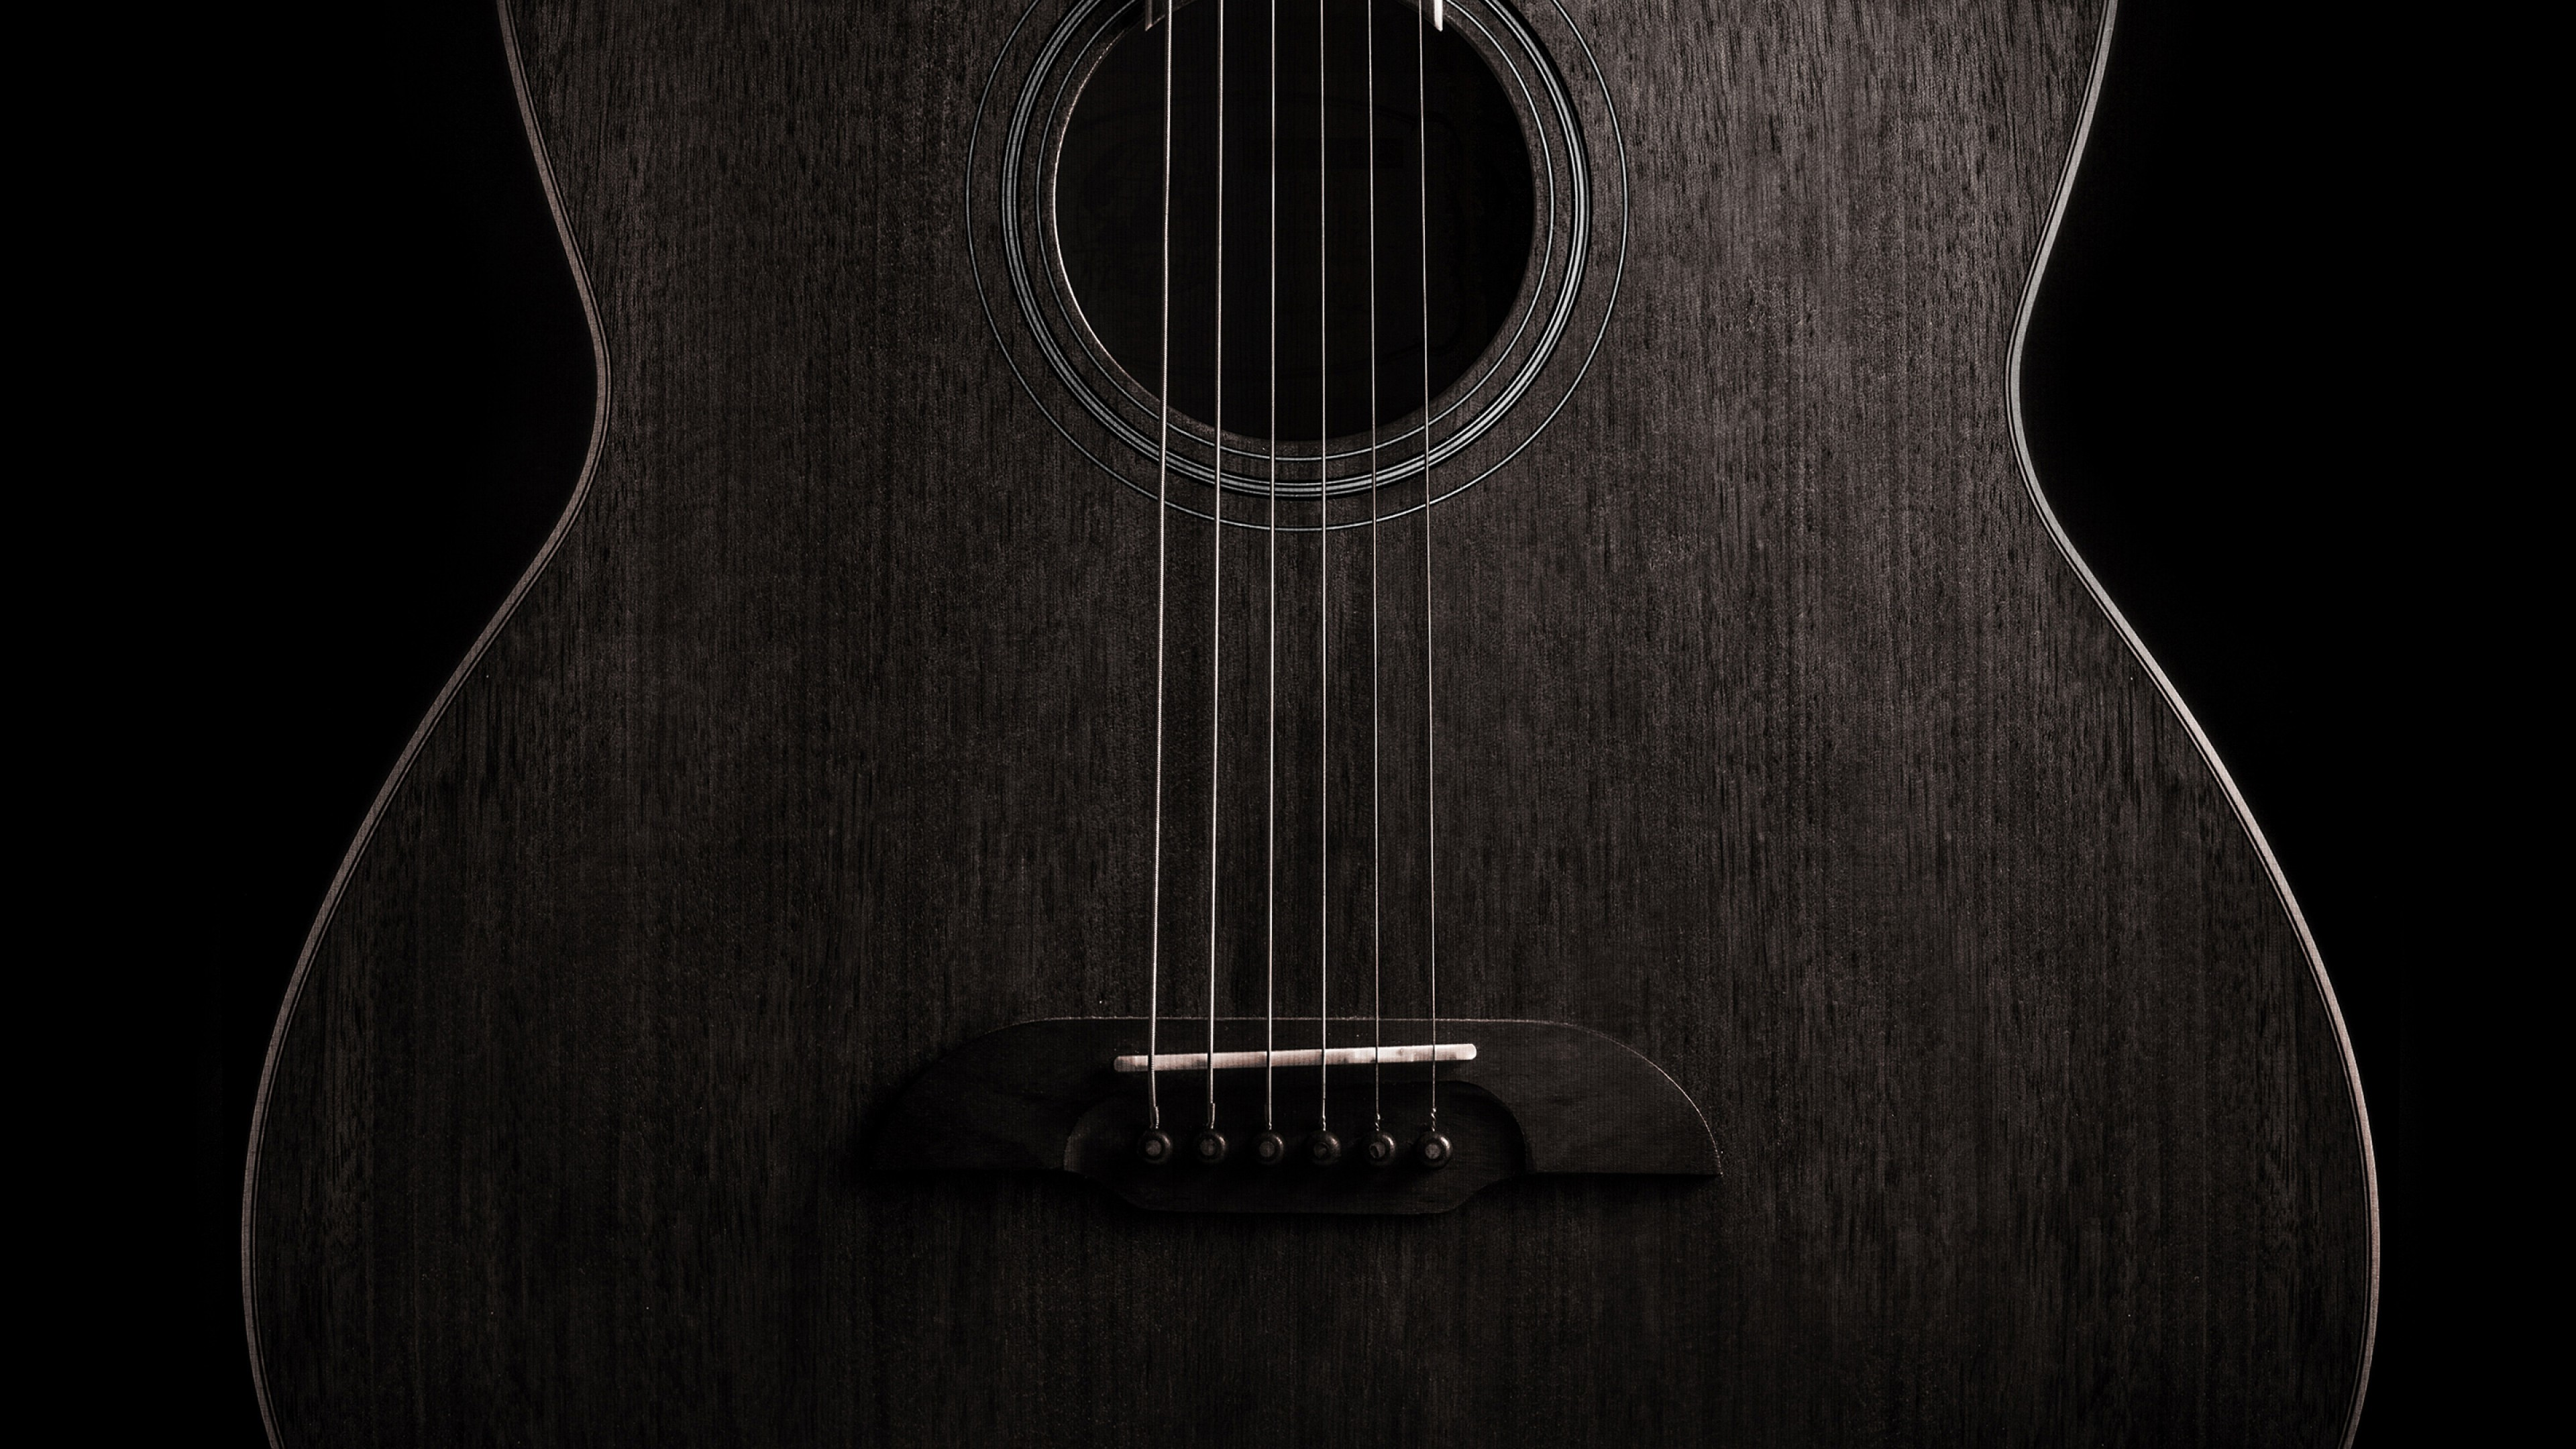 Music Instrument Wallpaper (69+ images)